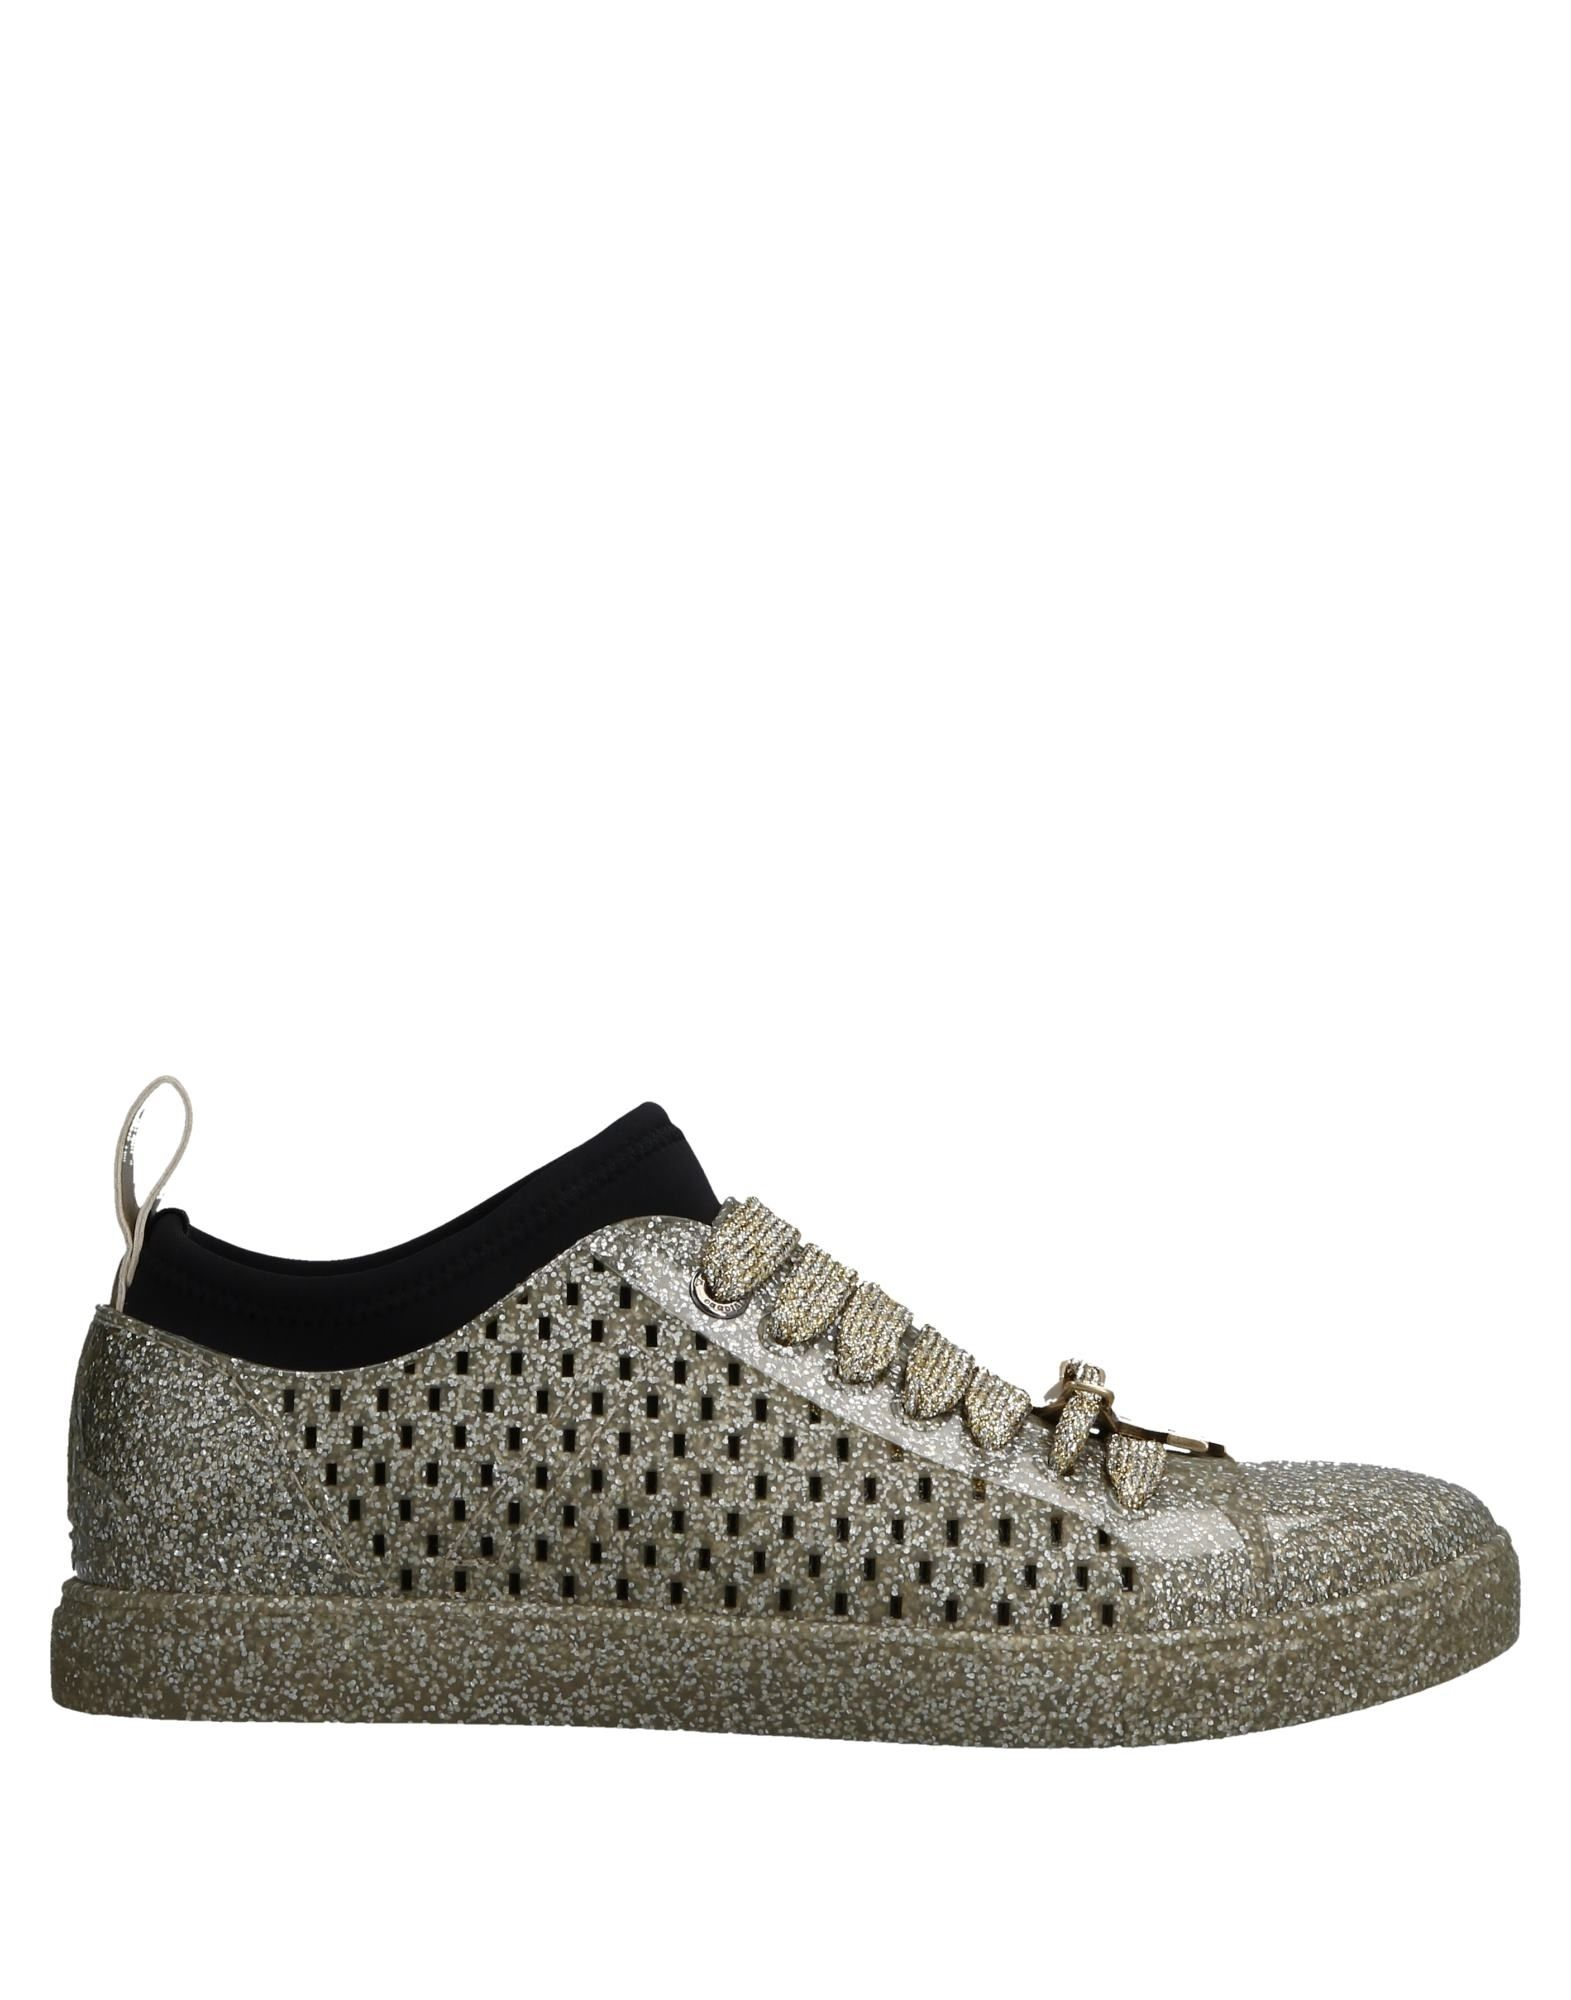 Vivienne Westwood Sneakers Herren  11519421KT Gute Qualität beliebte Schuhe